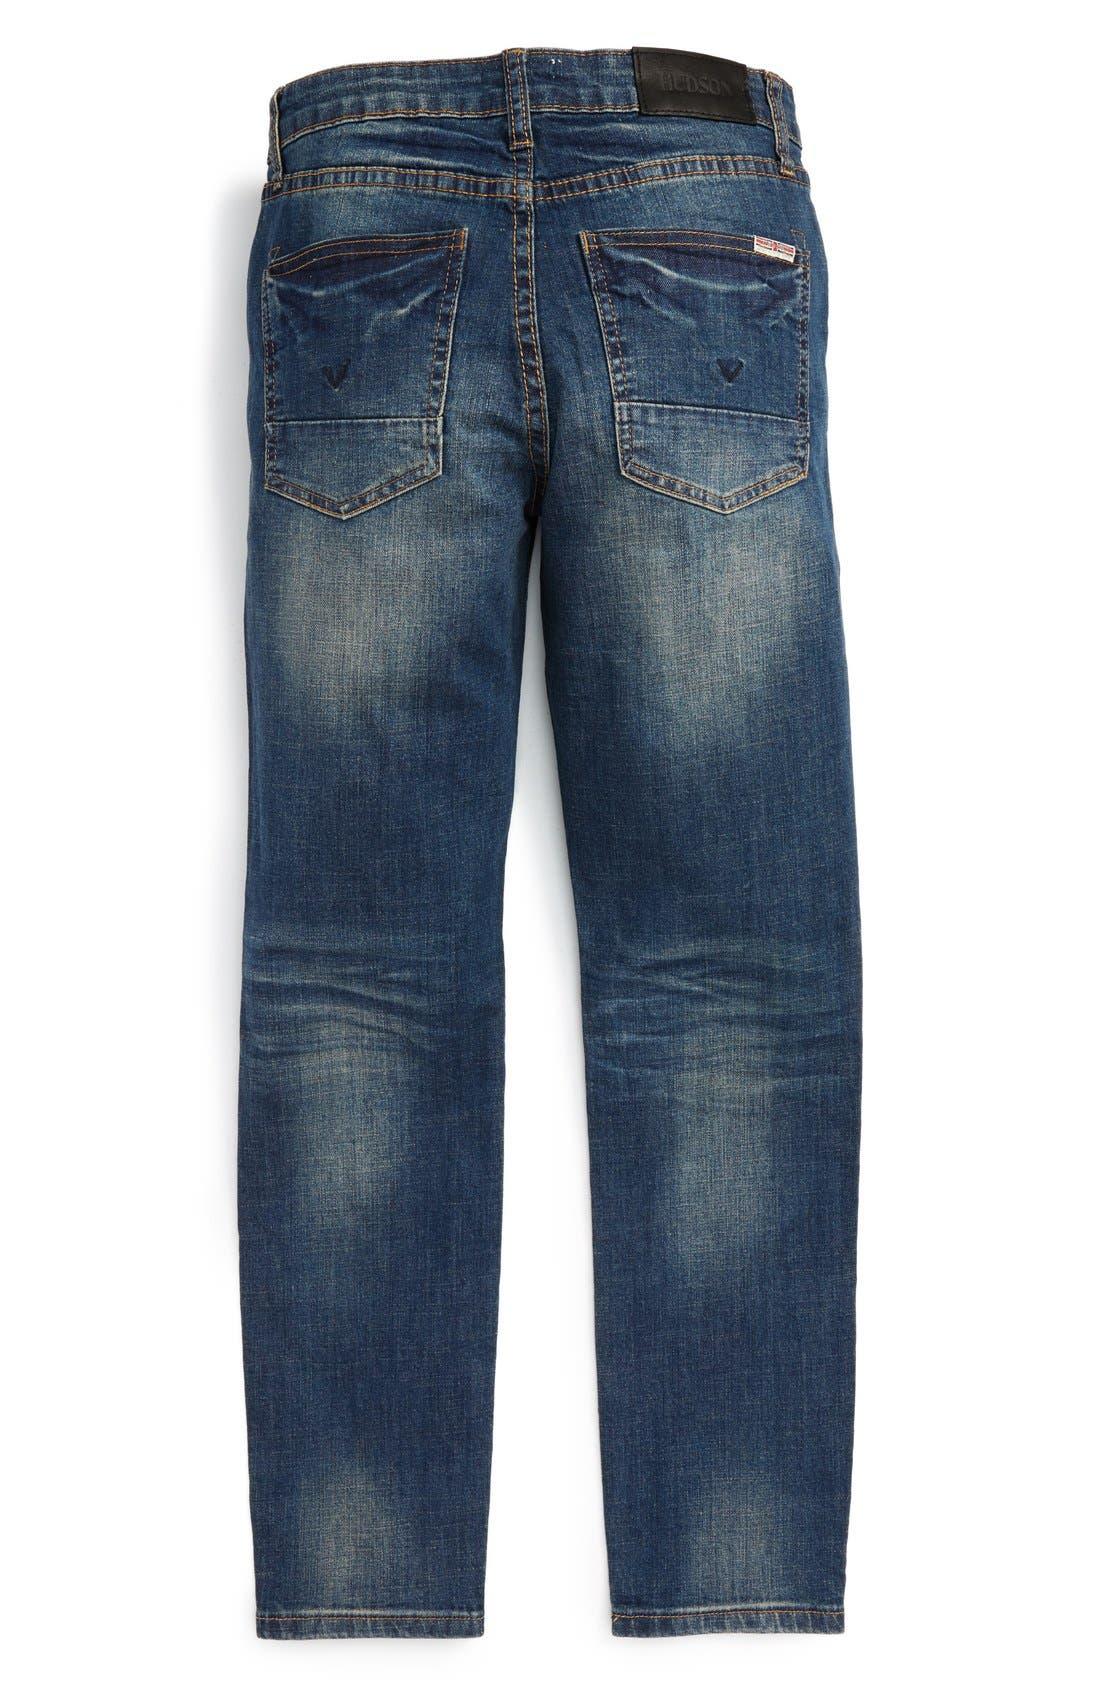 Jagger Slim Fit Straight Leg Jeans,                             Alternate thumbnail 10, color,